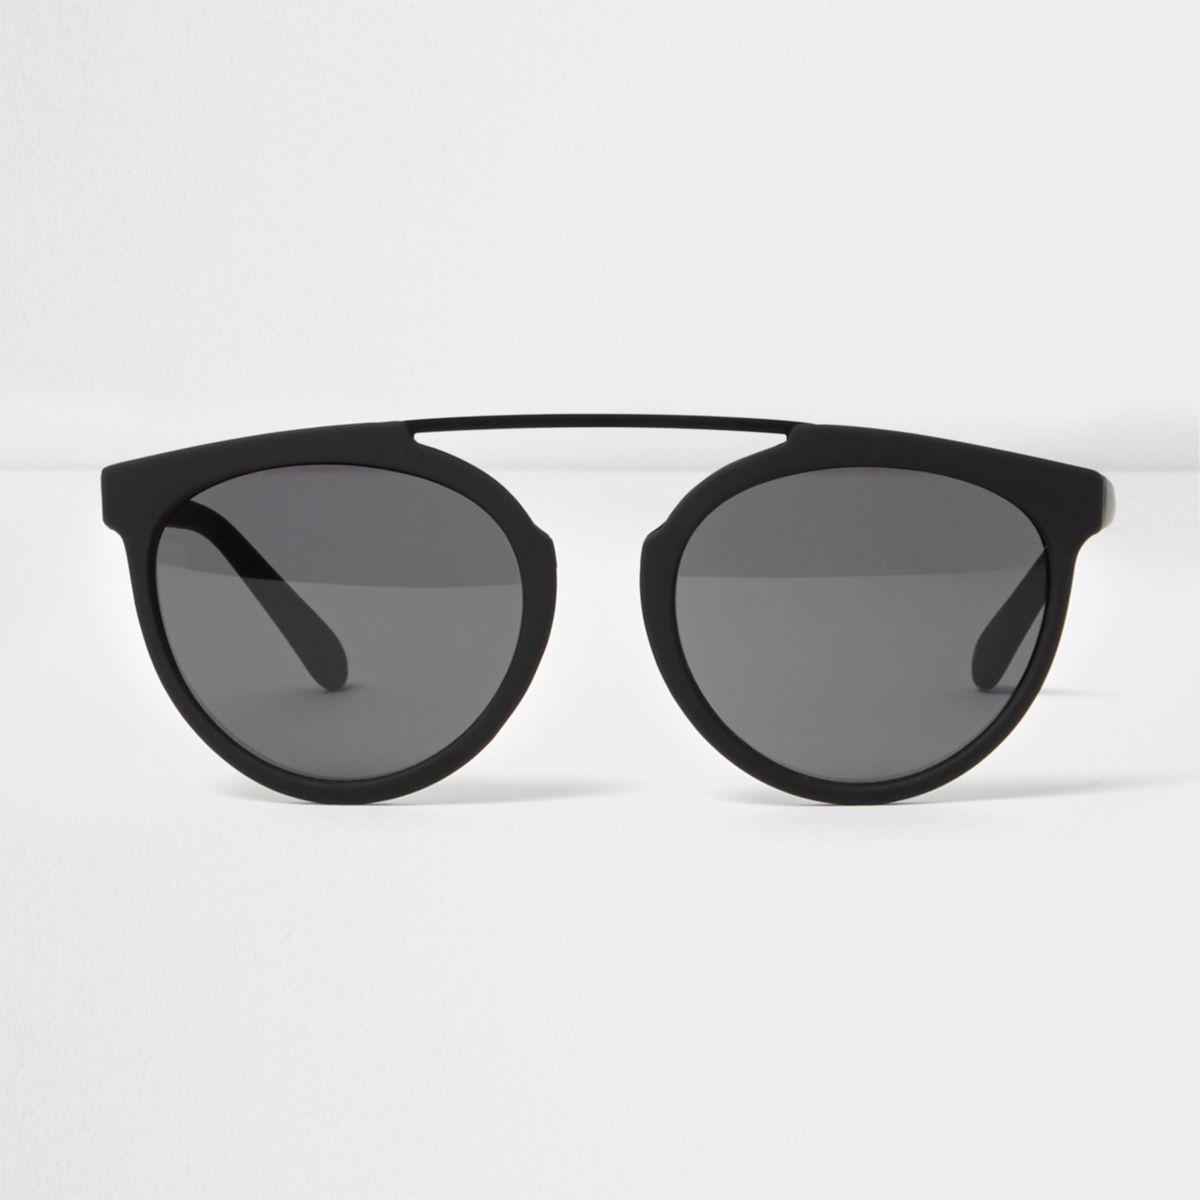 Black rubberised brow bar round sunglasses